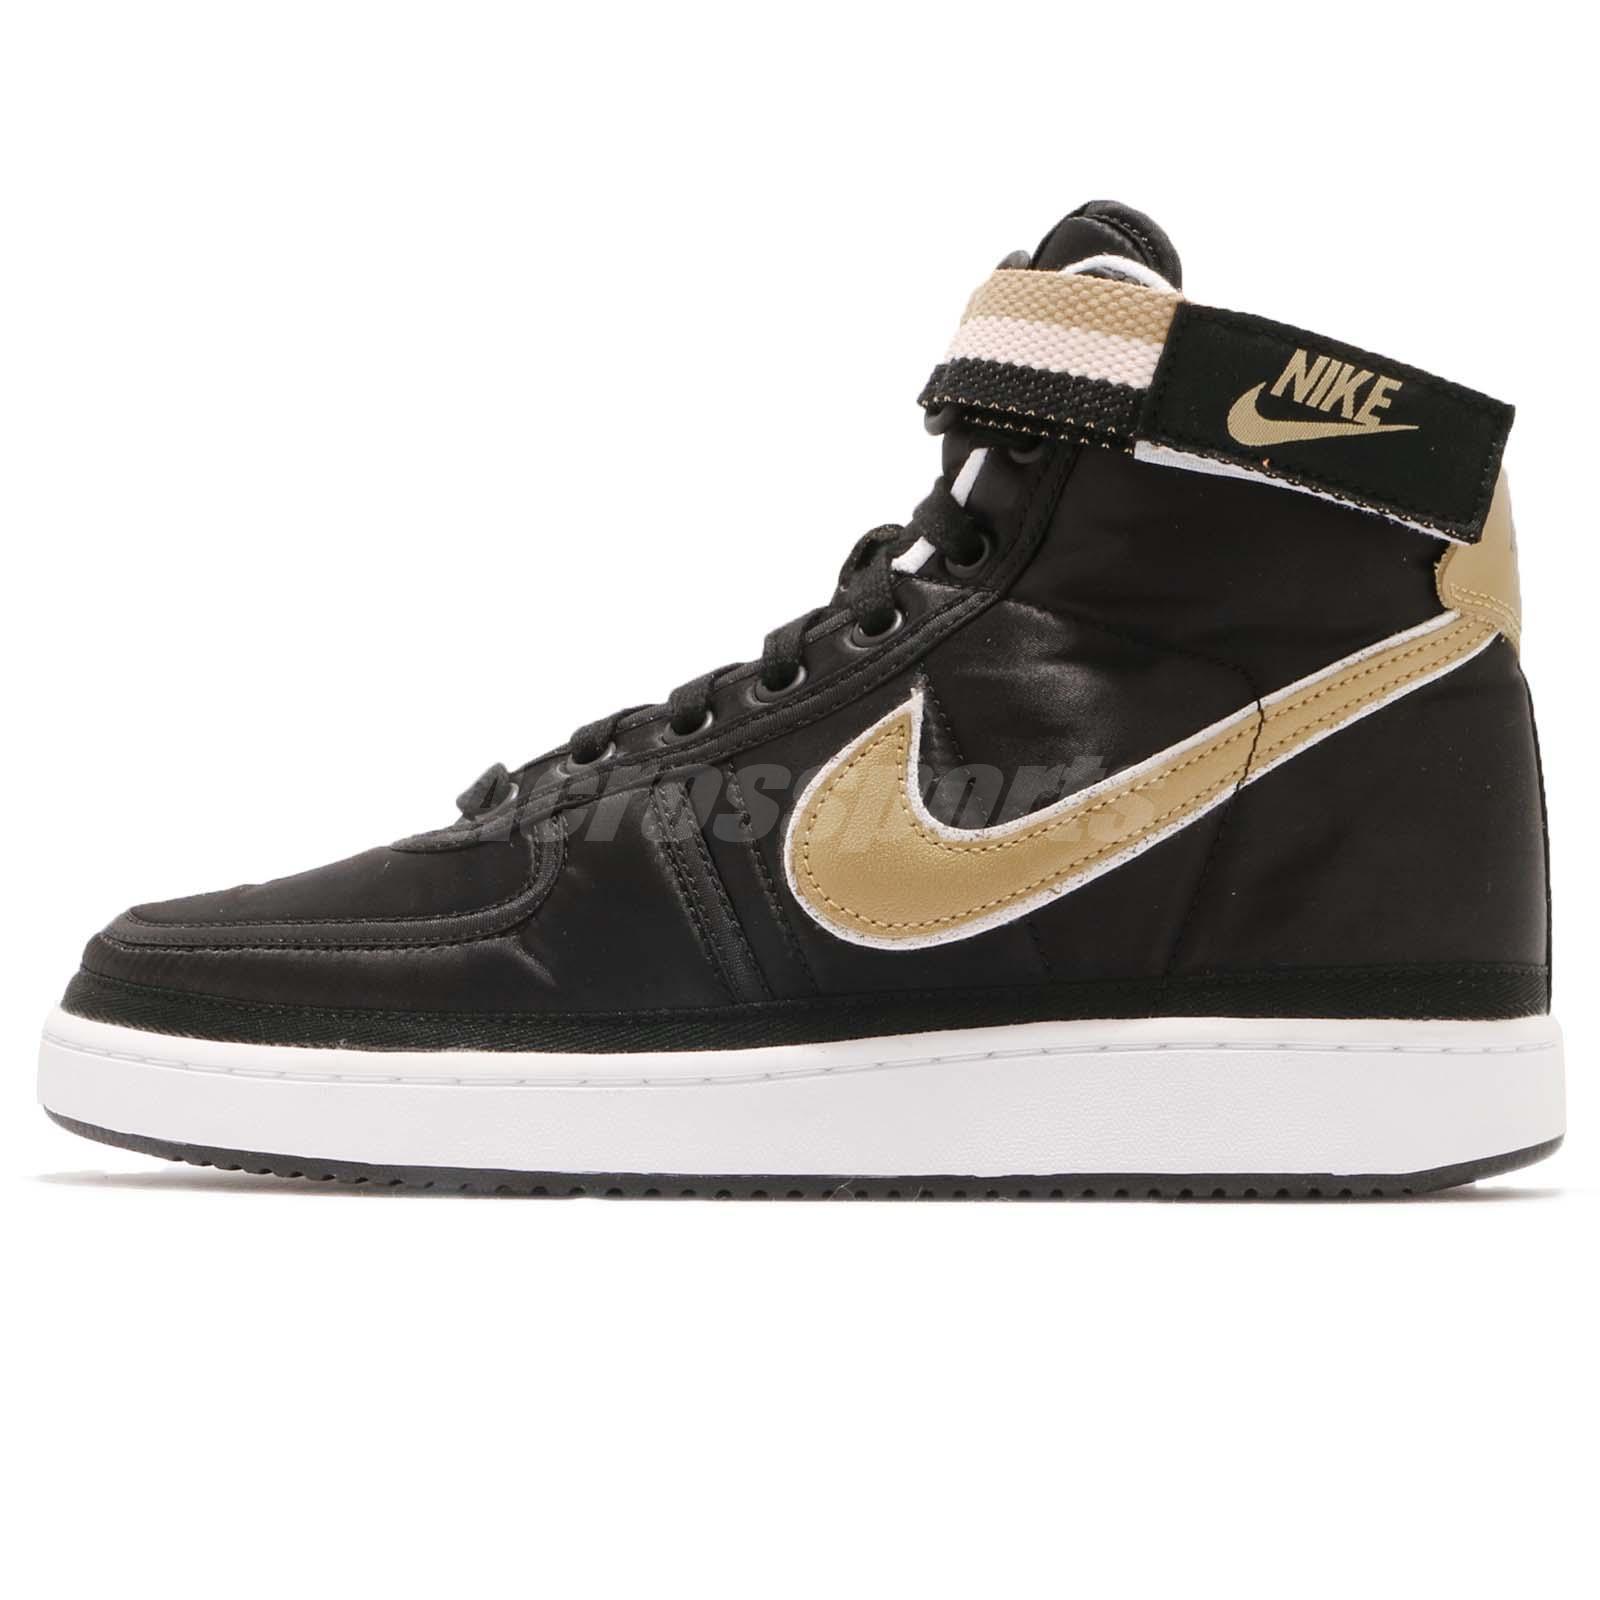 ce769929a852e0 Nike Vandal High Supreme QS Metallic Pack Black Satin Gold Men Shoes AH8652- 002